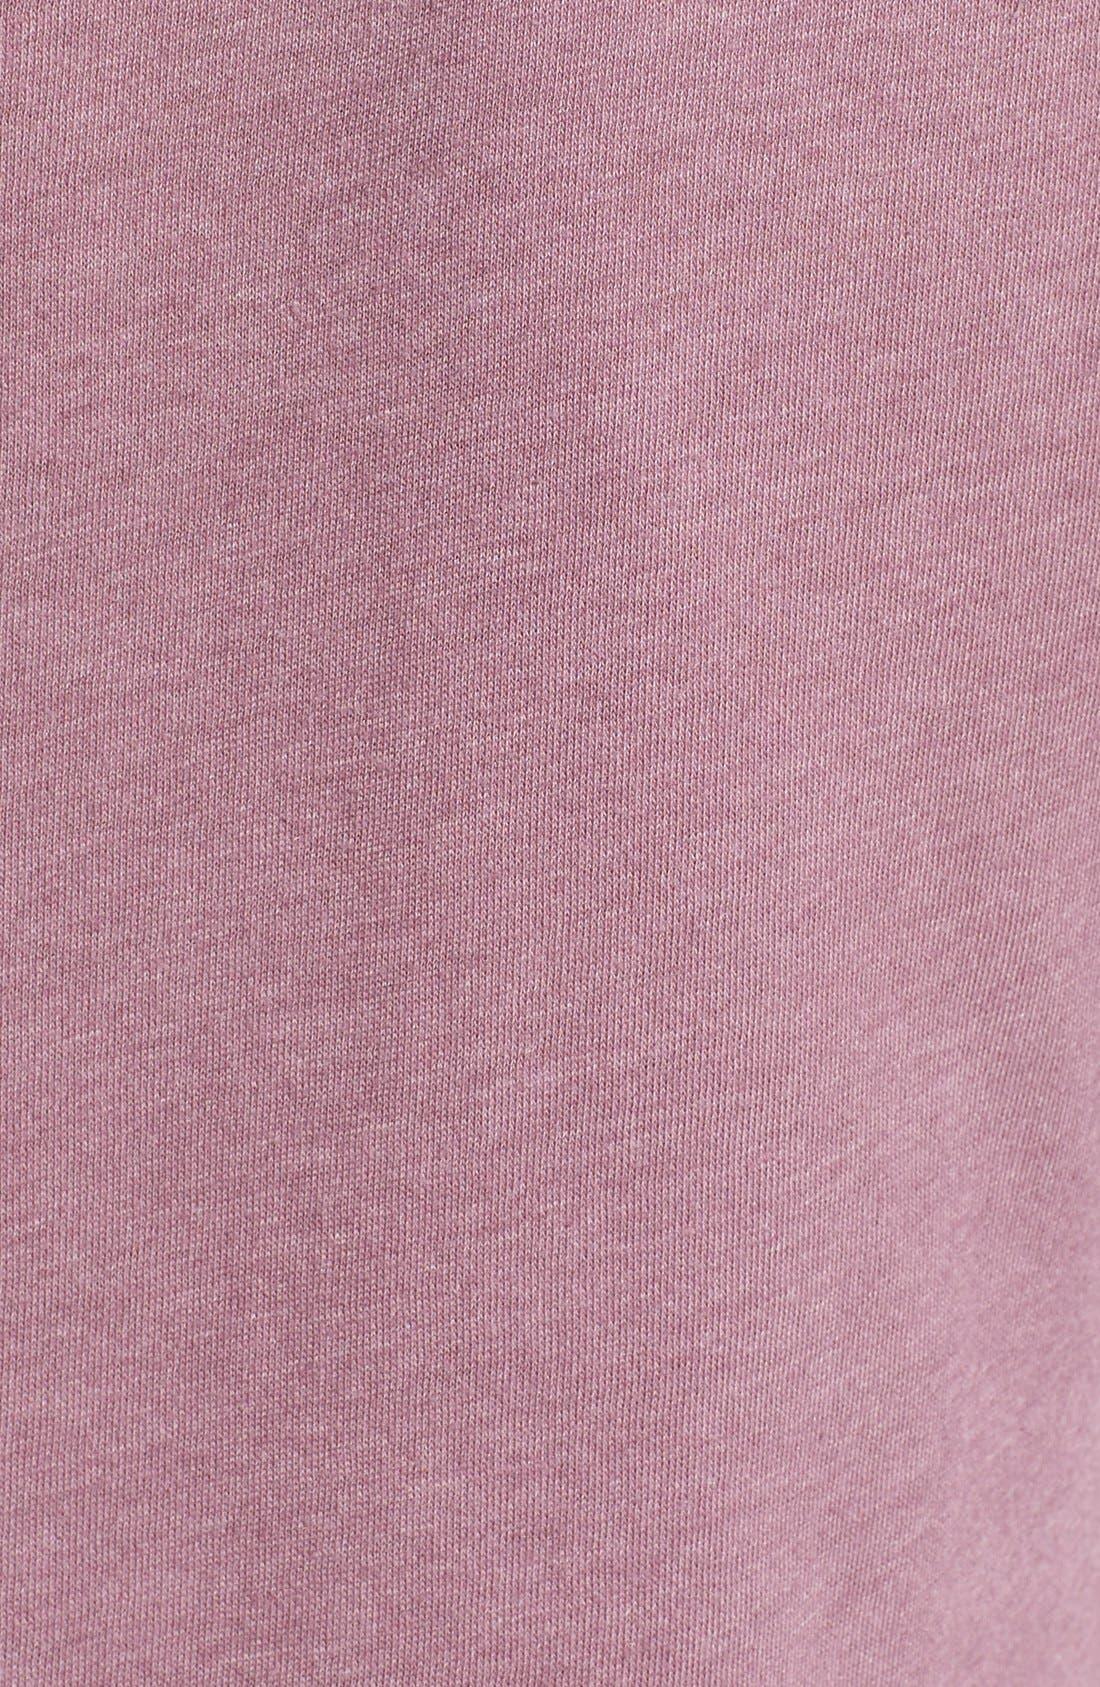 ,                             Scoop Neck Long Sleeve Tee,                             Alternate thumbnail 53, color,                             530